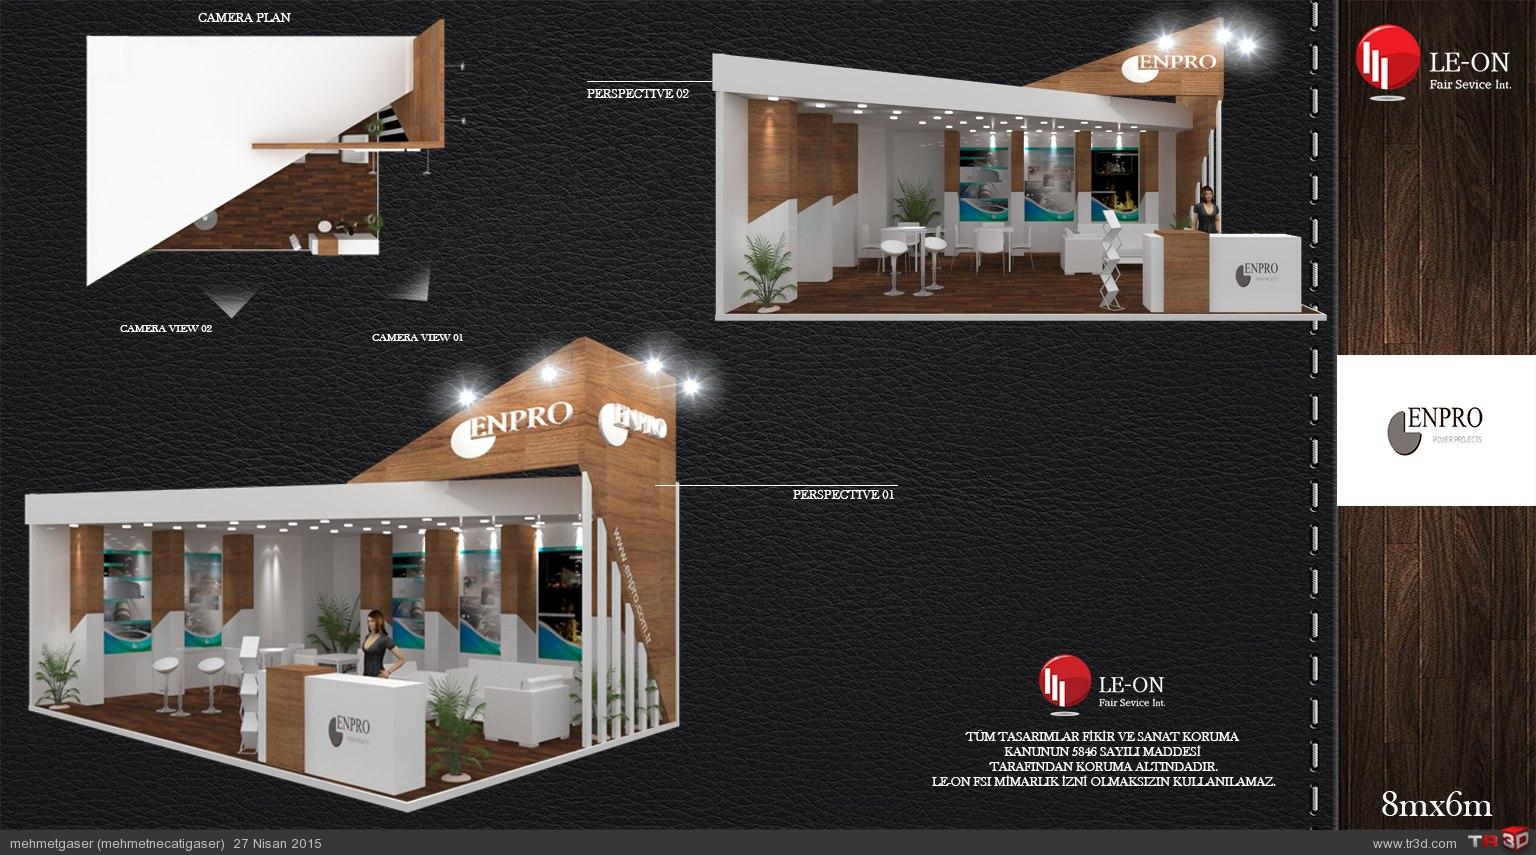 enpro stand design